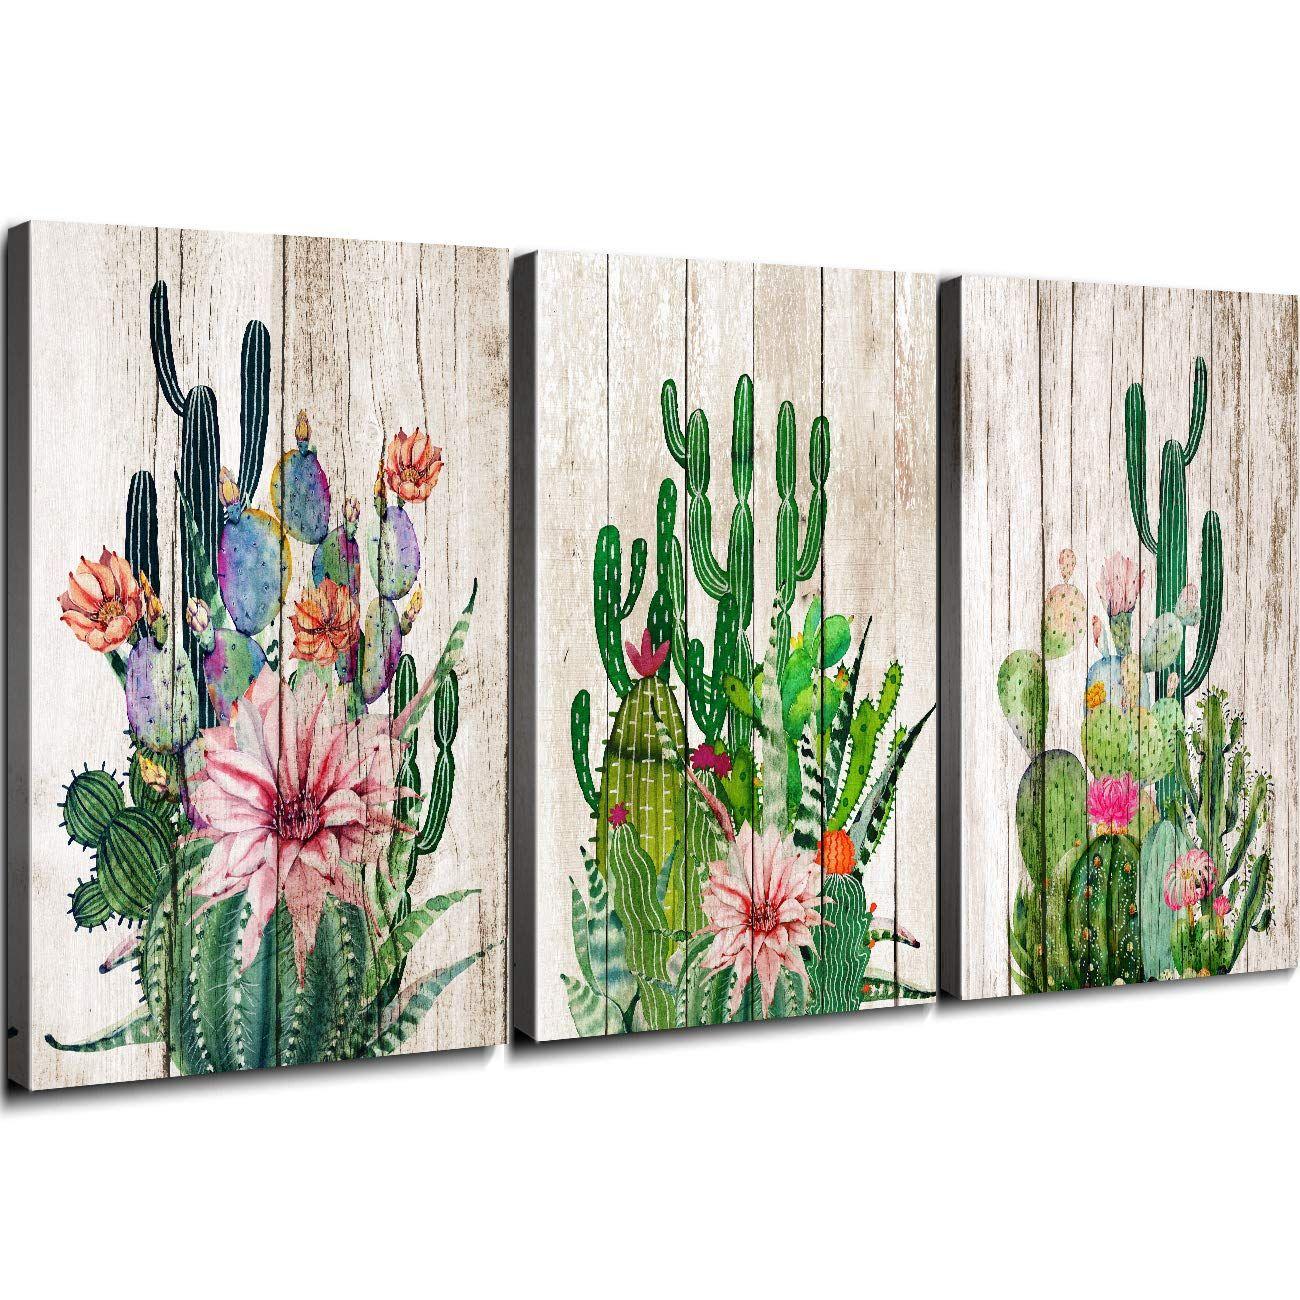 Yoooahu Cactus Decor Bathroom Canvas Prints Wall Art Green Tropical Desert Fleshy Plant Watercolor Paintings H In 2020 Kaktus Inneneinrichtung Papierpflanzen Wandkunst